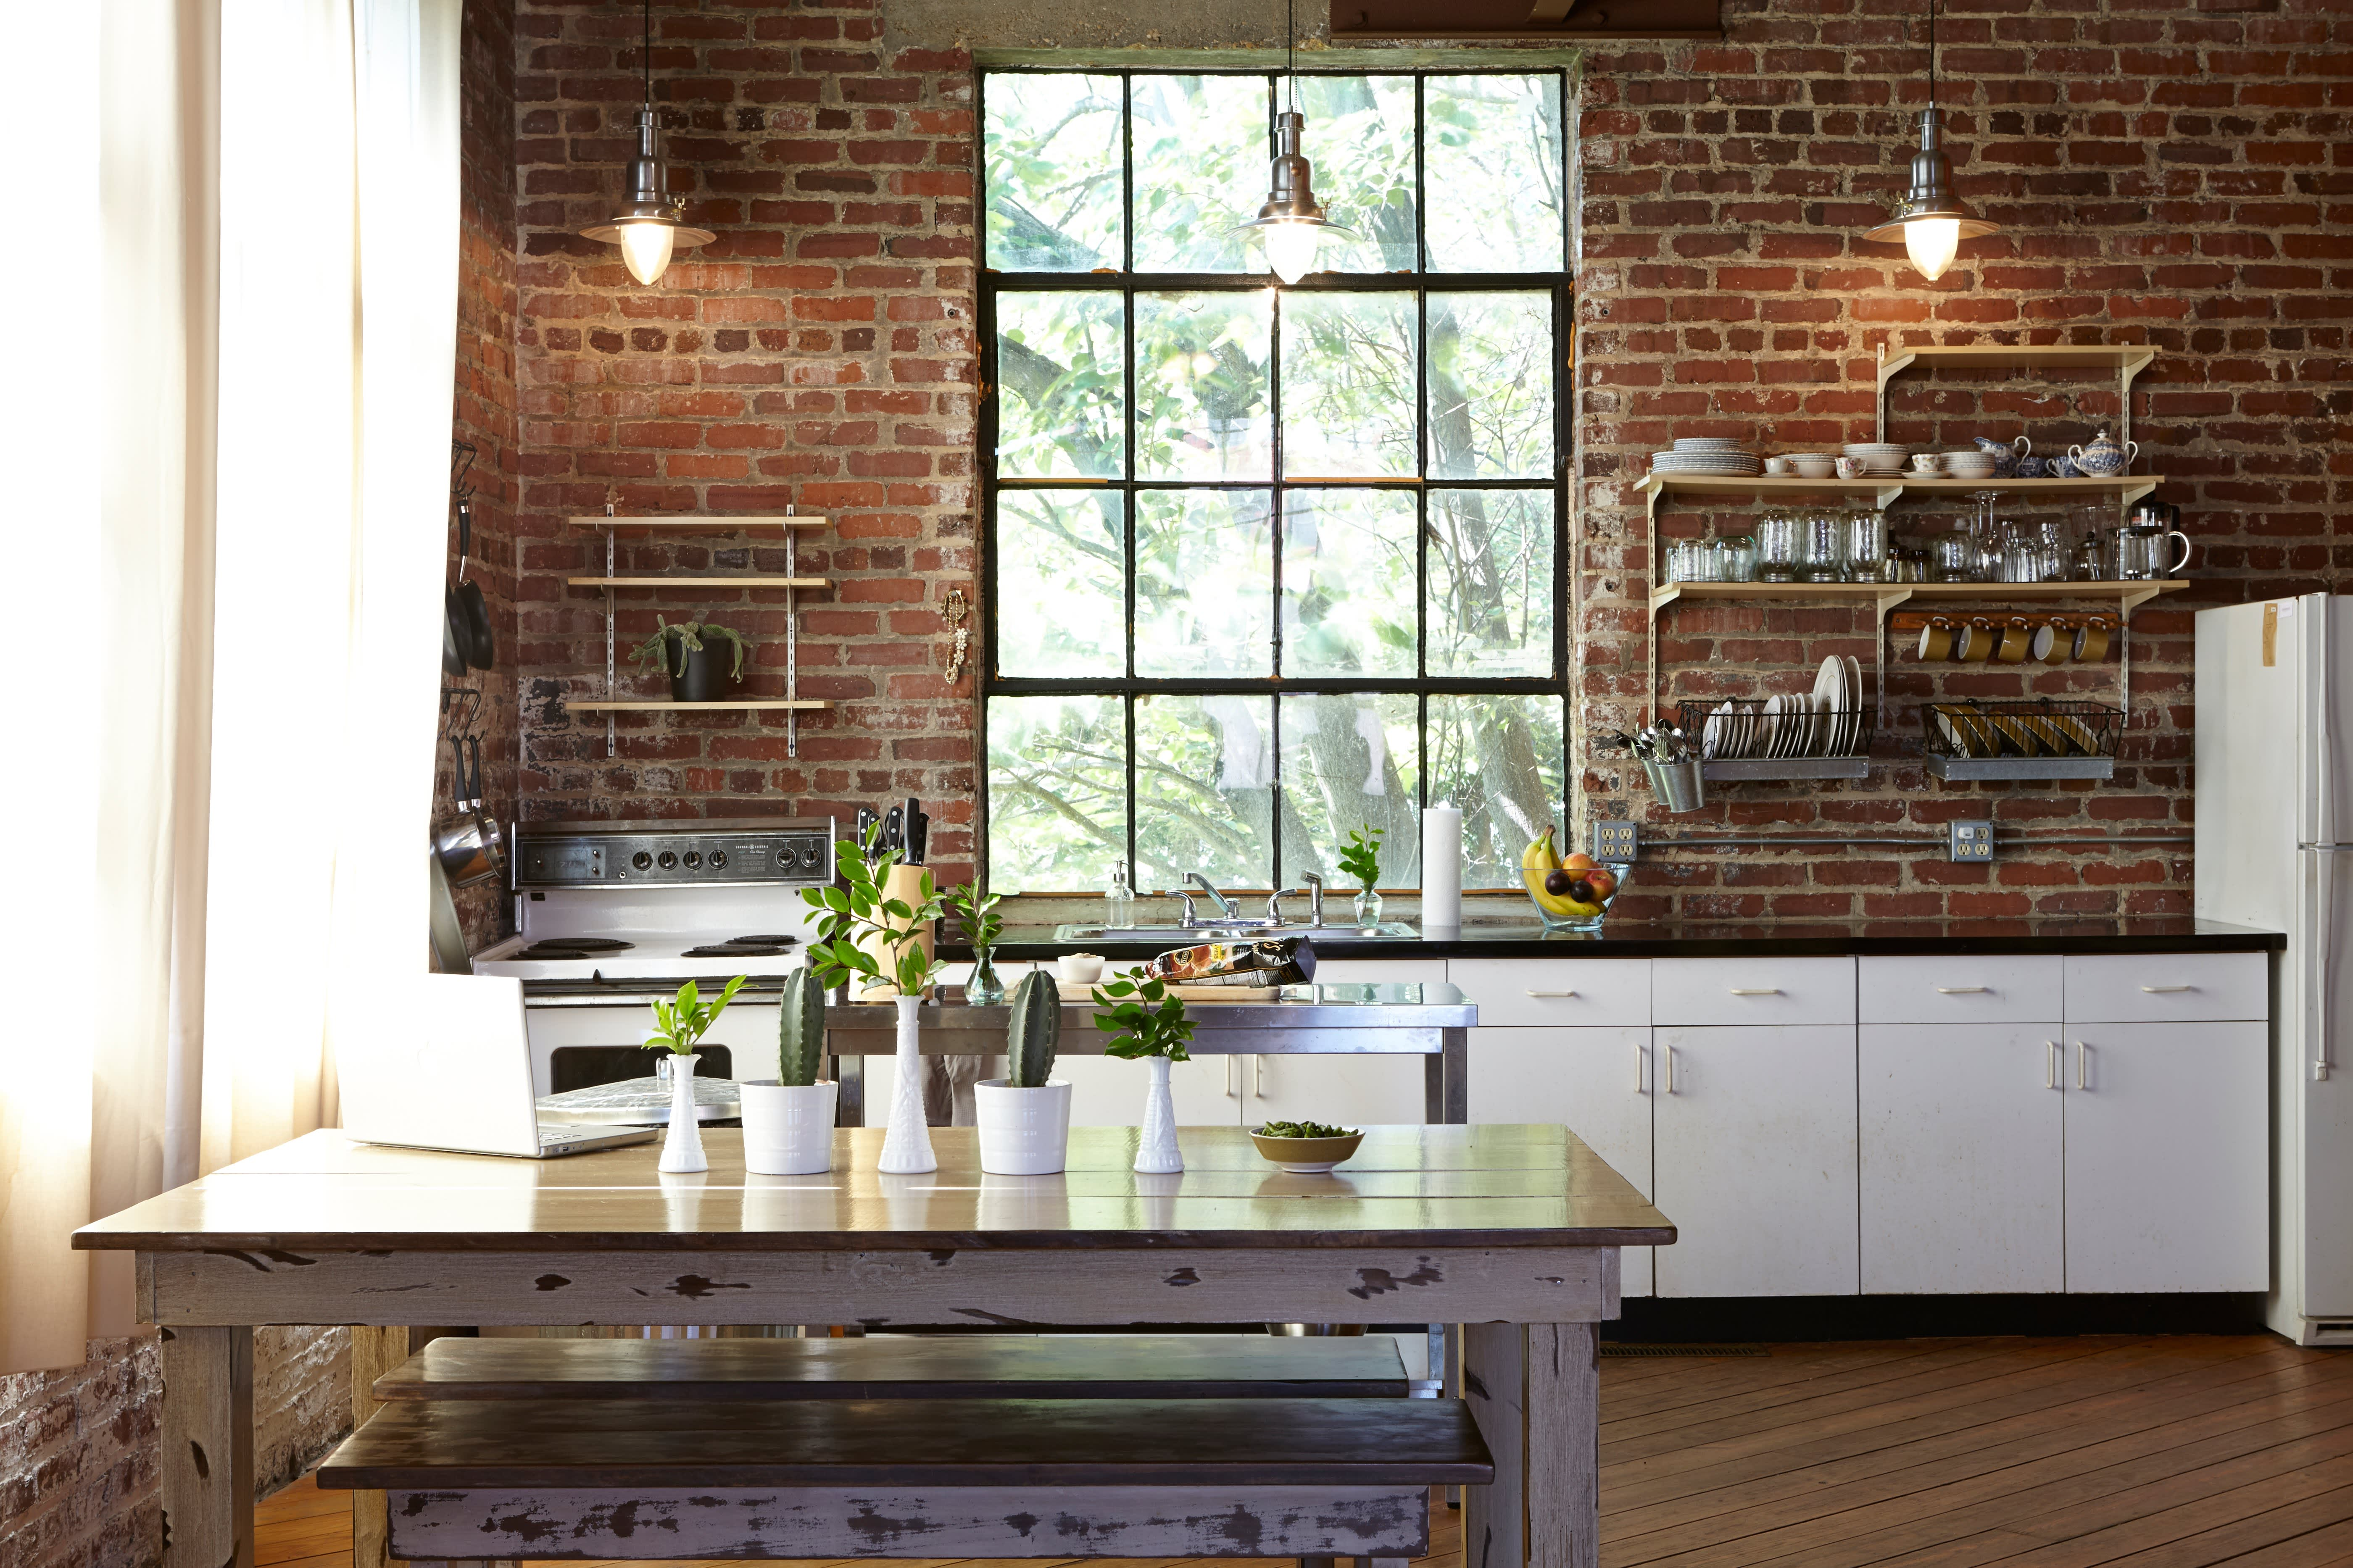 Julia's Open, Antique-Industrial Atlanta Kitchen: gallery image 1